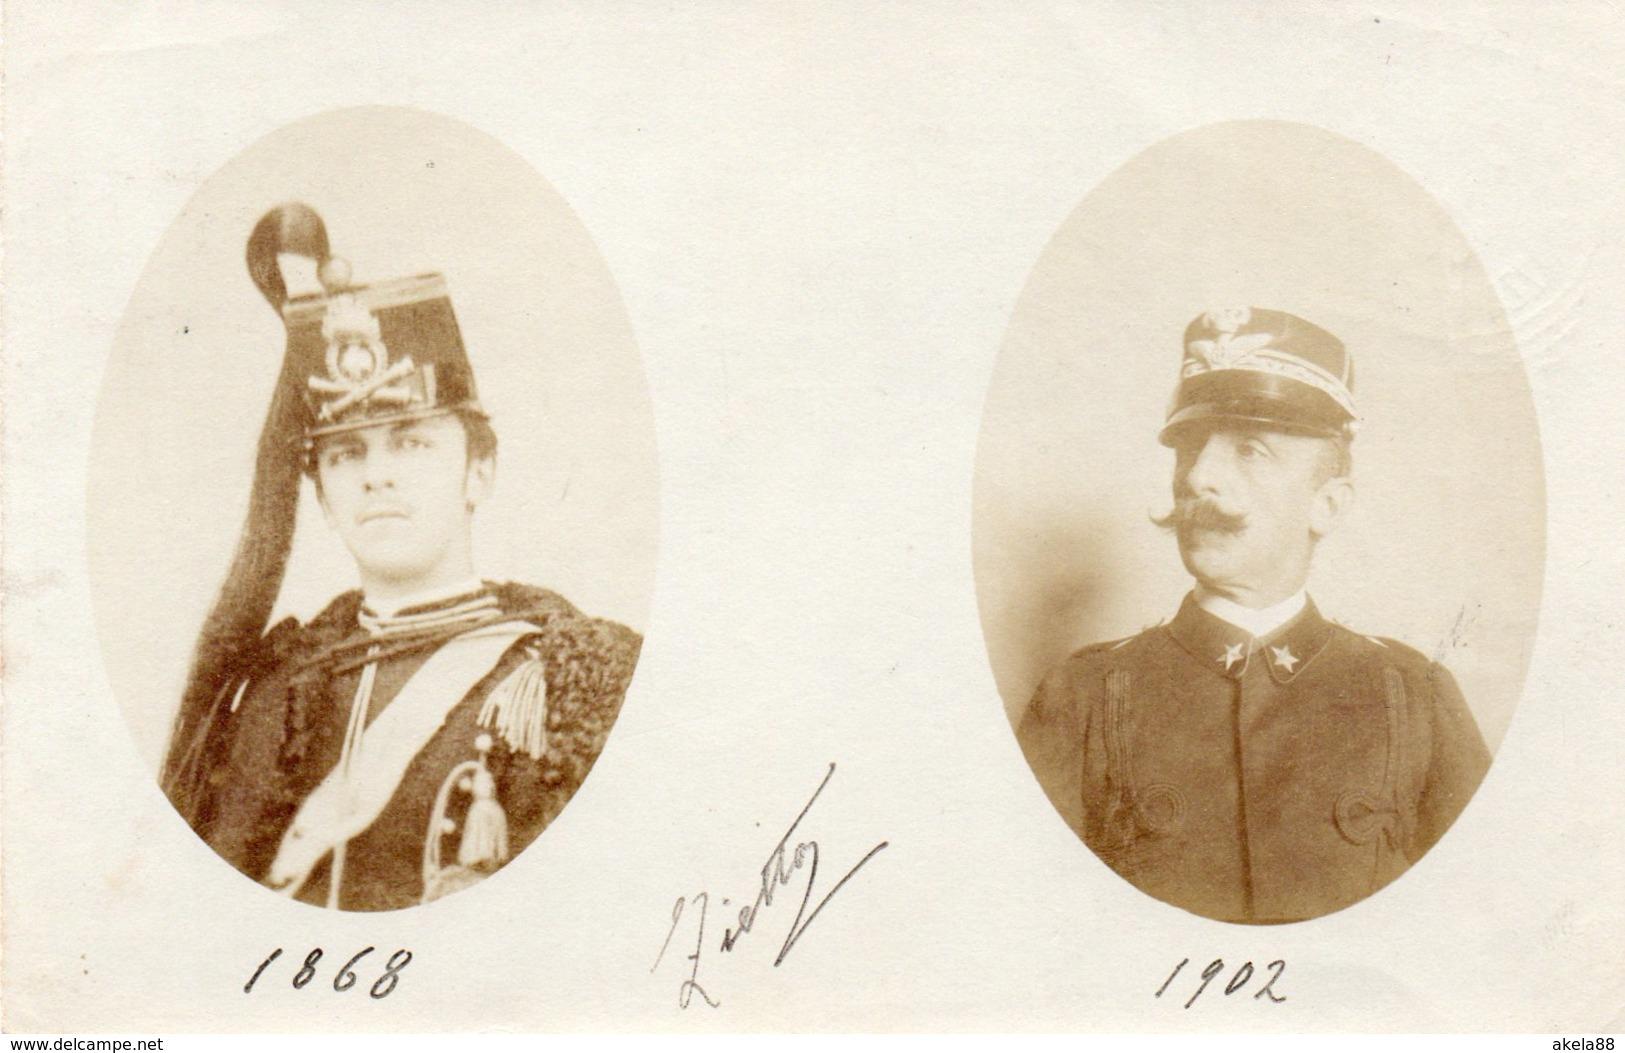 PADOVA - ARTIGLIERIA - ARTIGLIERE - UNIFORME - Uniformi